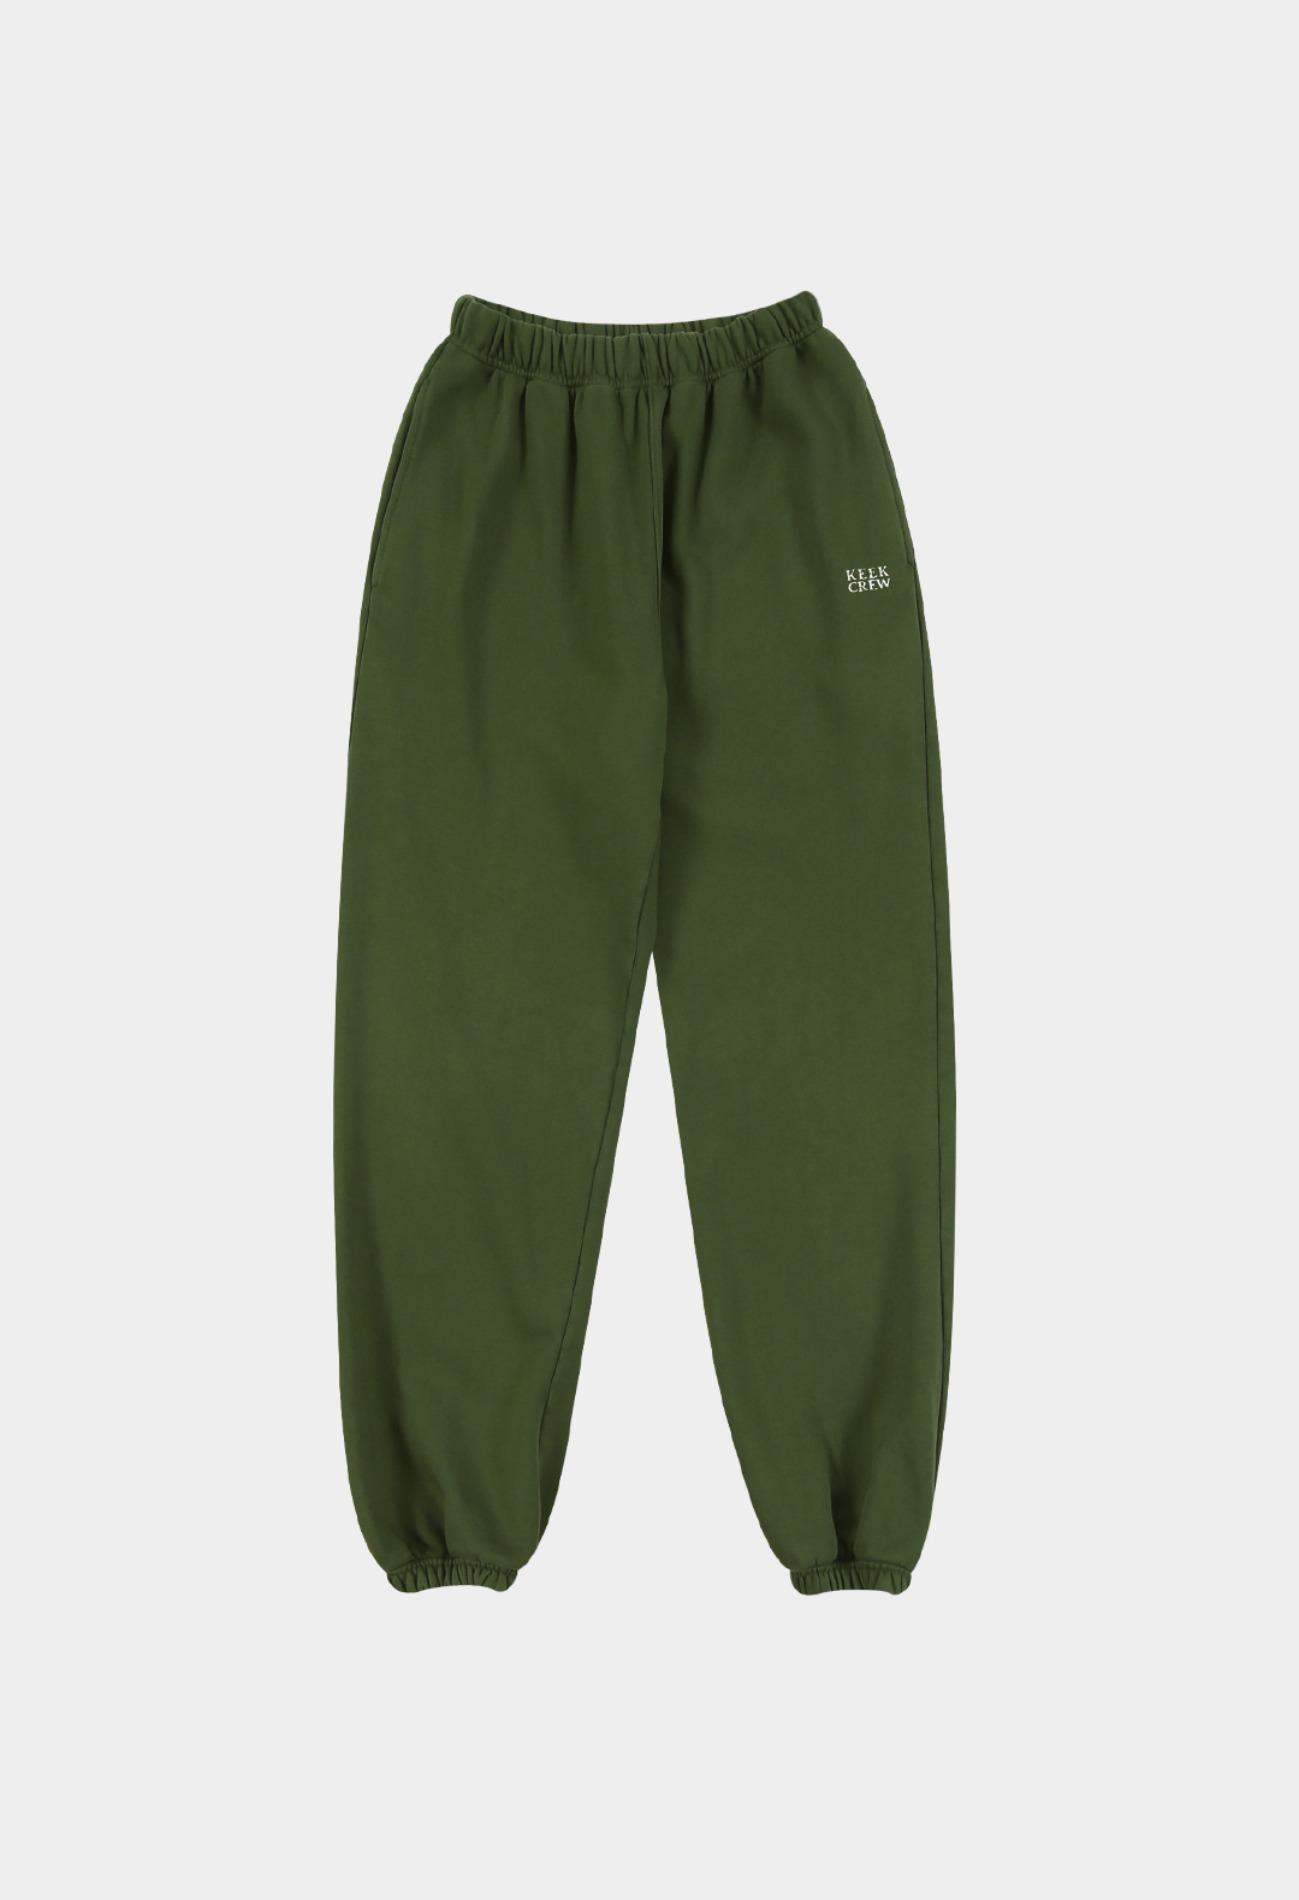 keek Pigment Sweatpants by KEEK CREW - Green 스트릿패션 유니섹스브랜드 커플시밀러룩 남자쇼핑몰 여성의류쇼핑몰 후드티 힙색